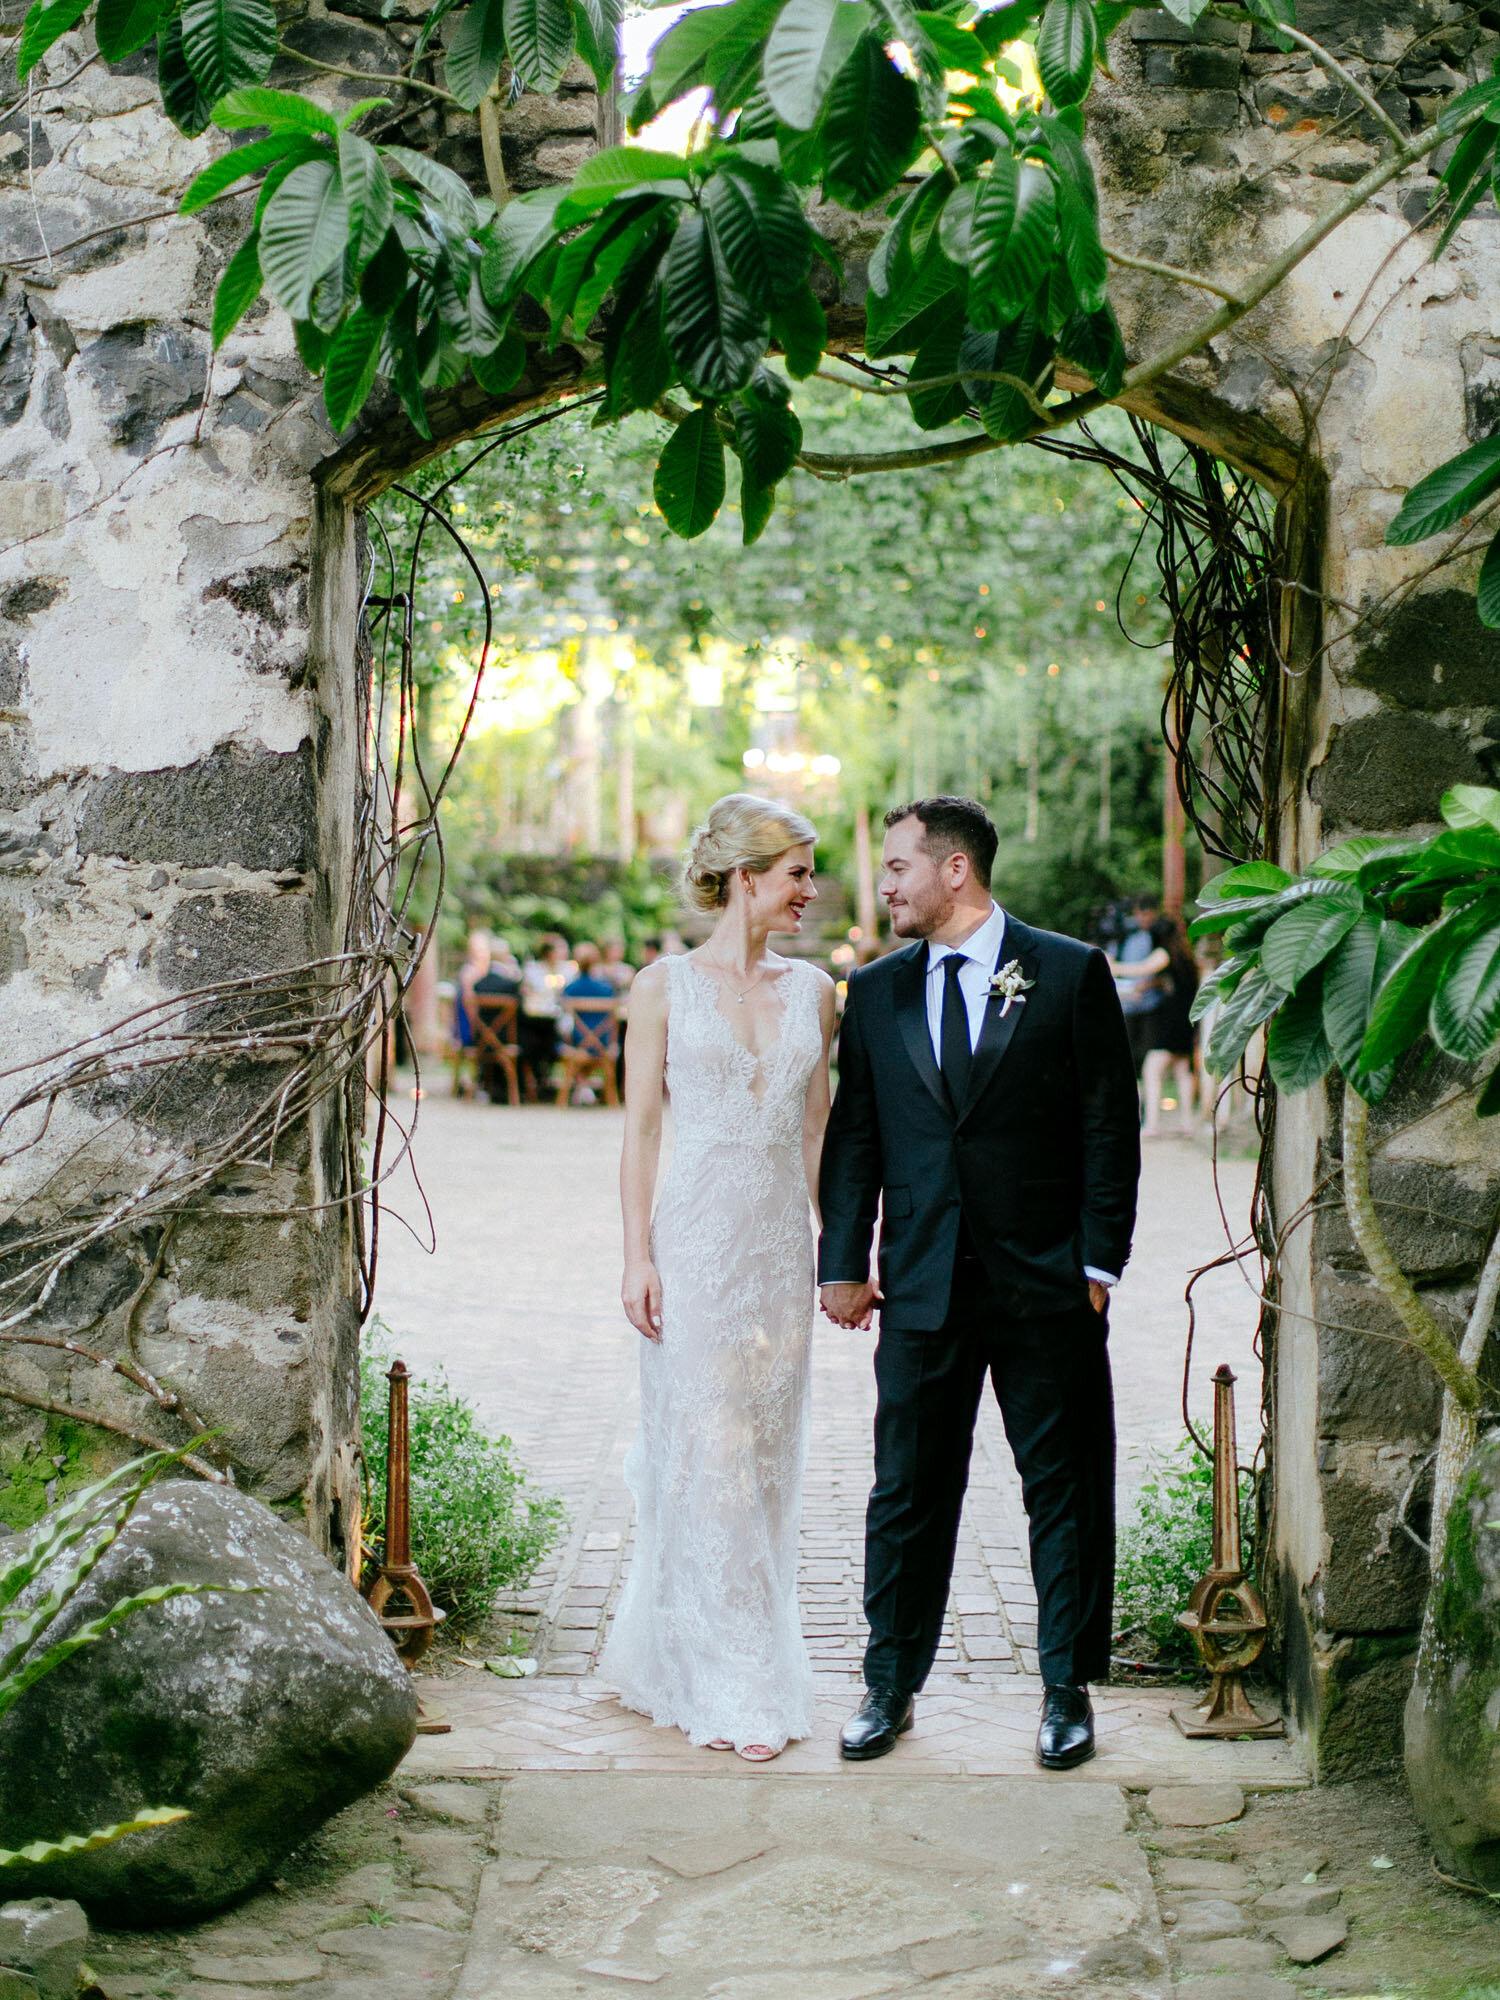 Chris-J-Evans-Maui-Wedding-Kim&Brian4216.jpg